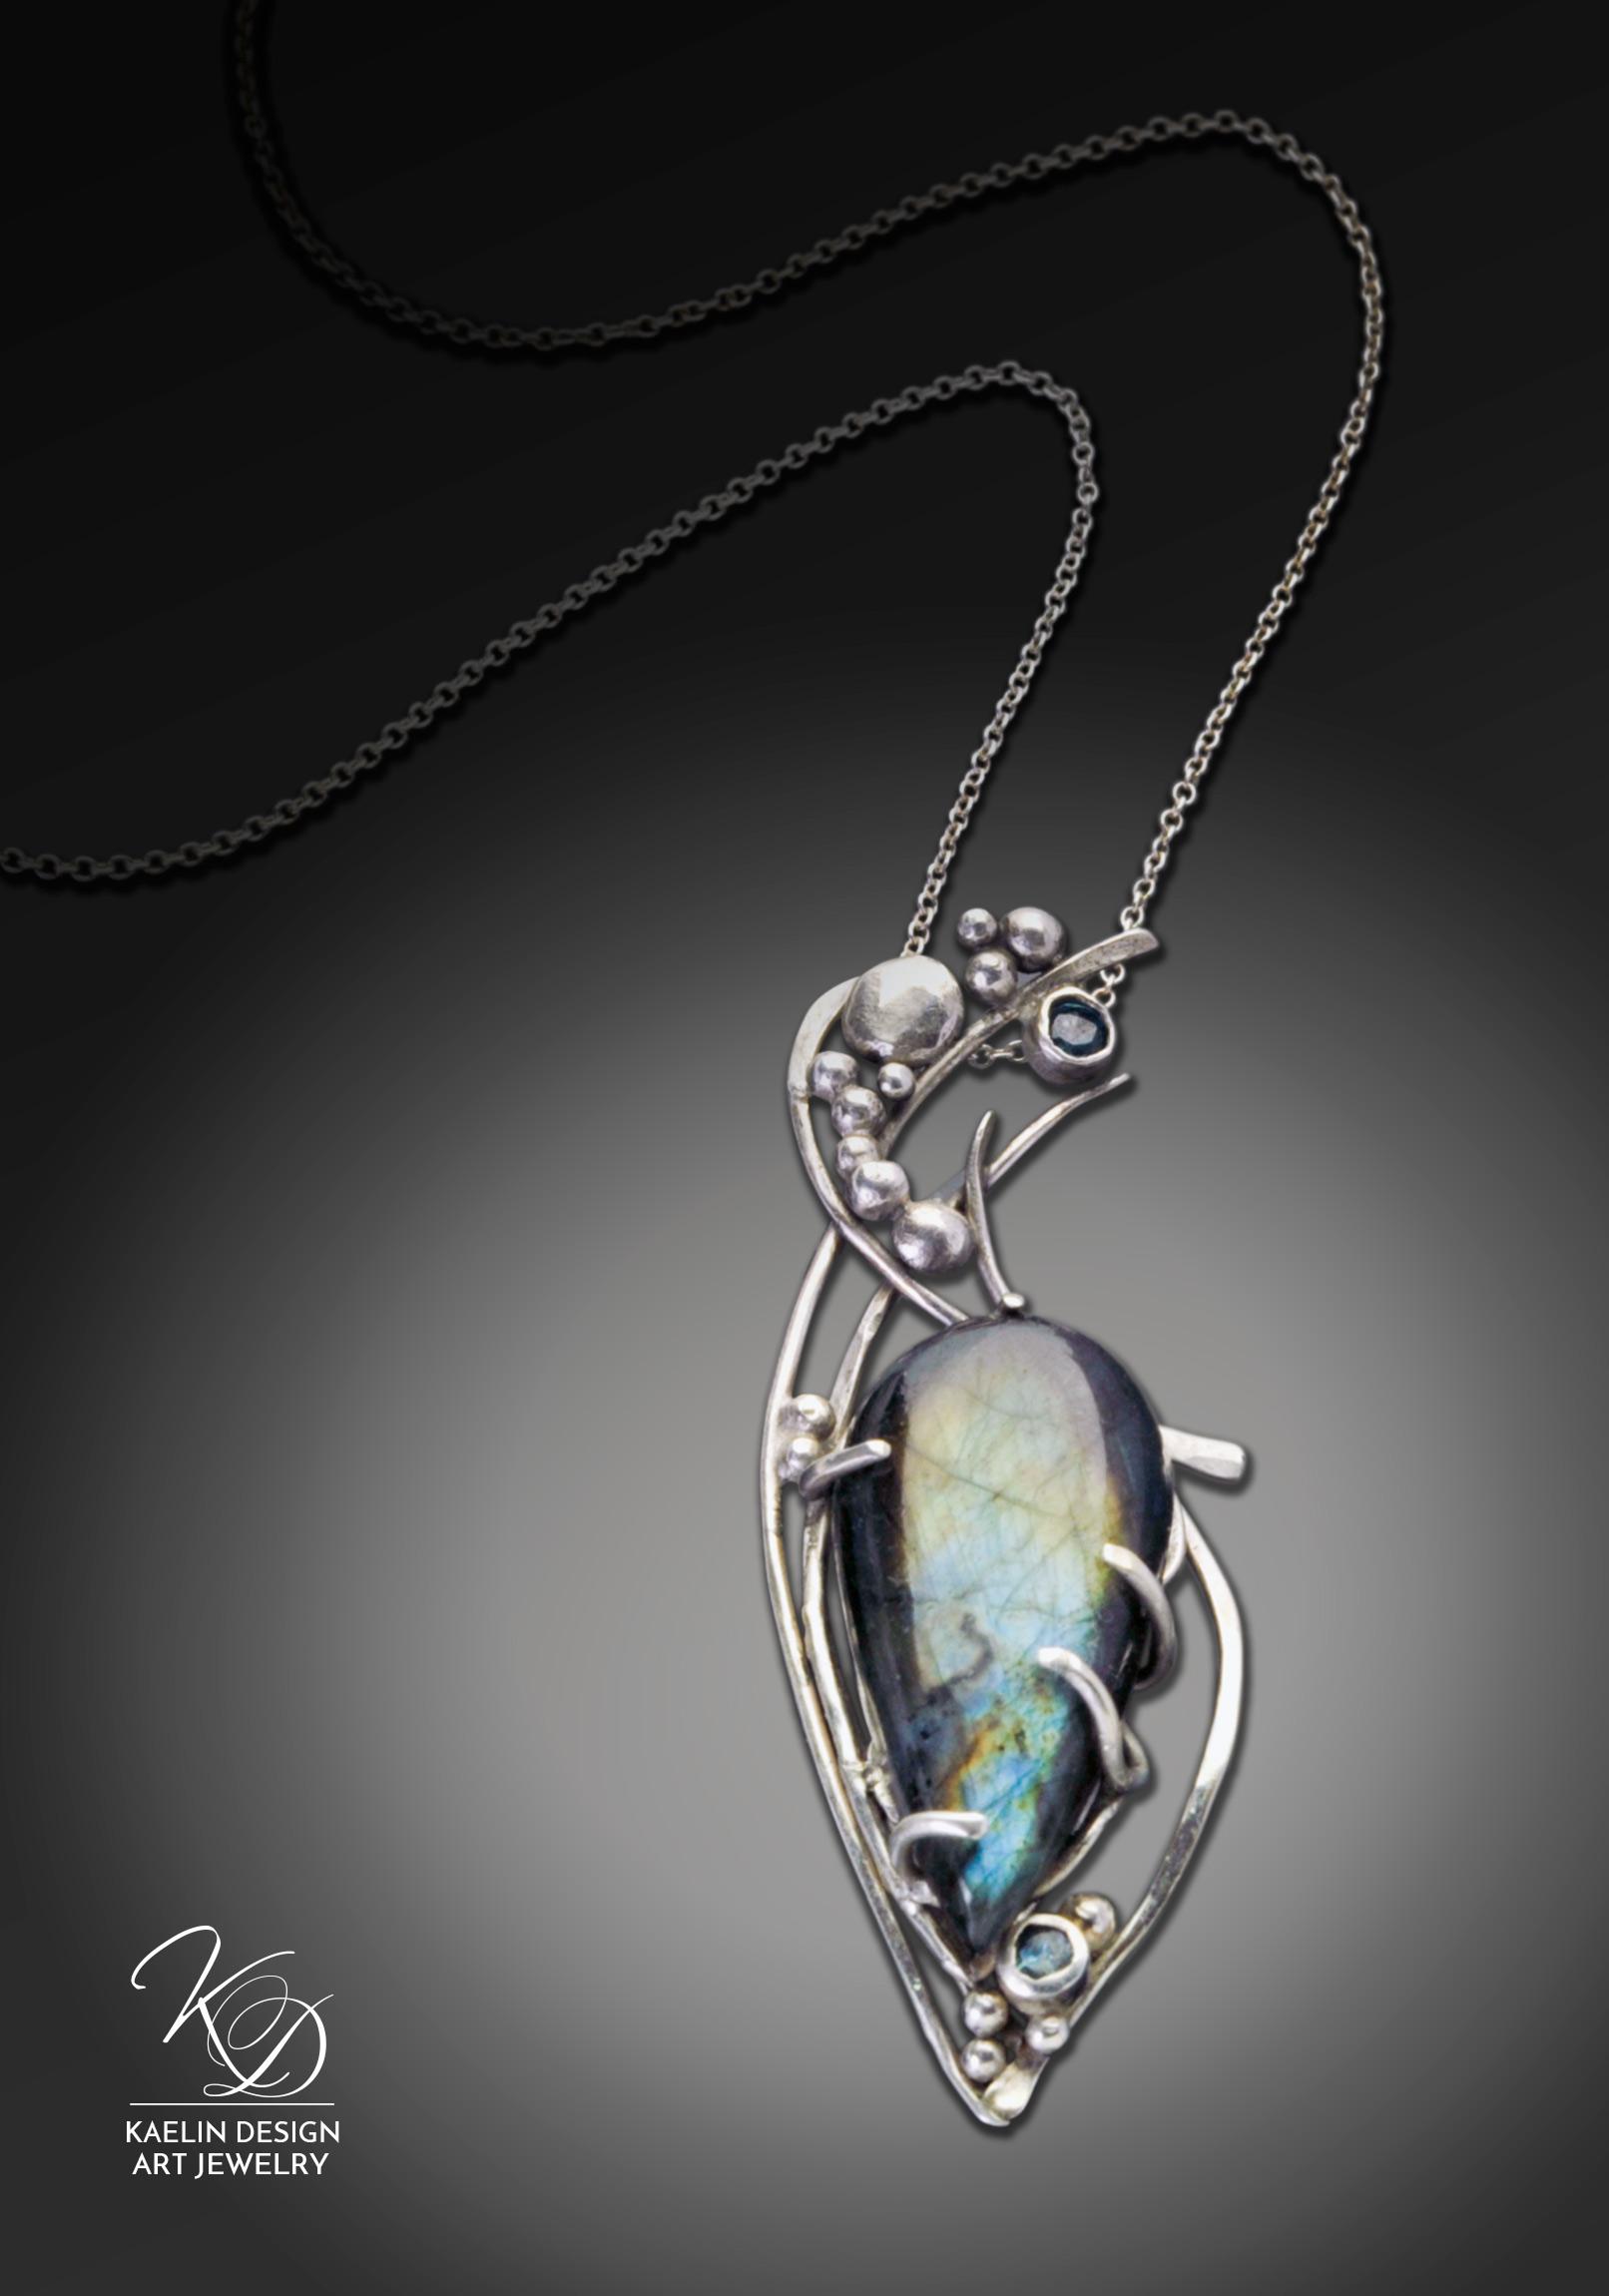 Whisper of Paradise Labradorite and Topaz Fine Art Pendant by Kaelin Design